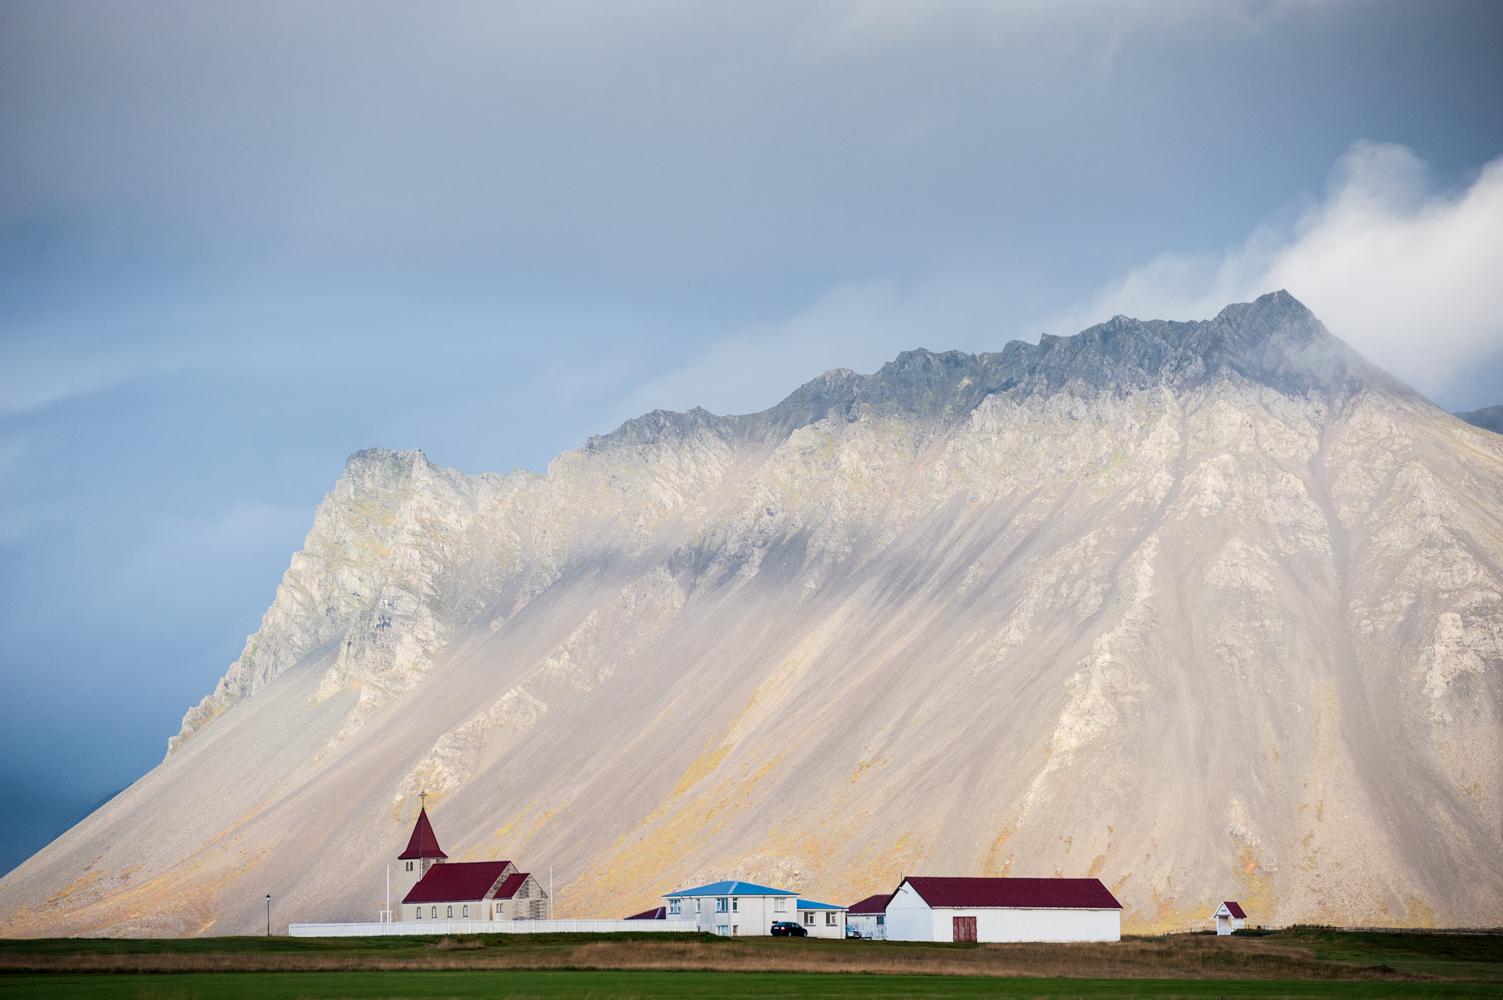 Near Vegamót Snæfellsnesi, Iceland